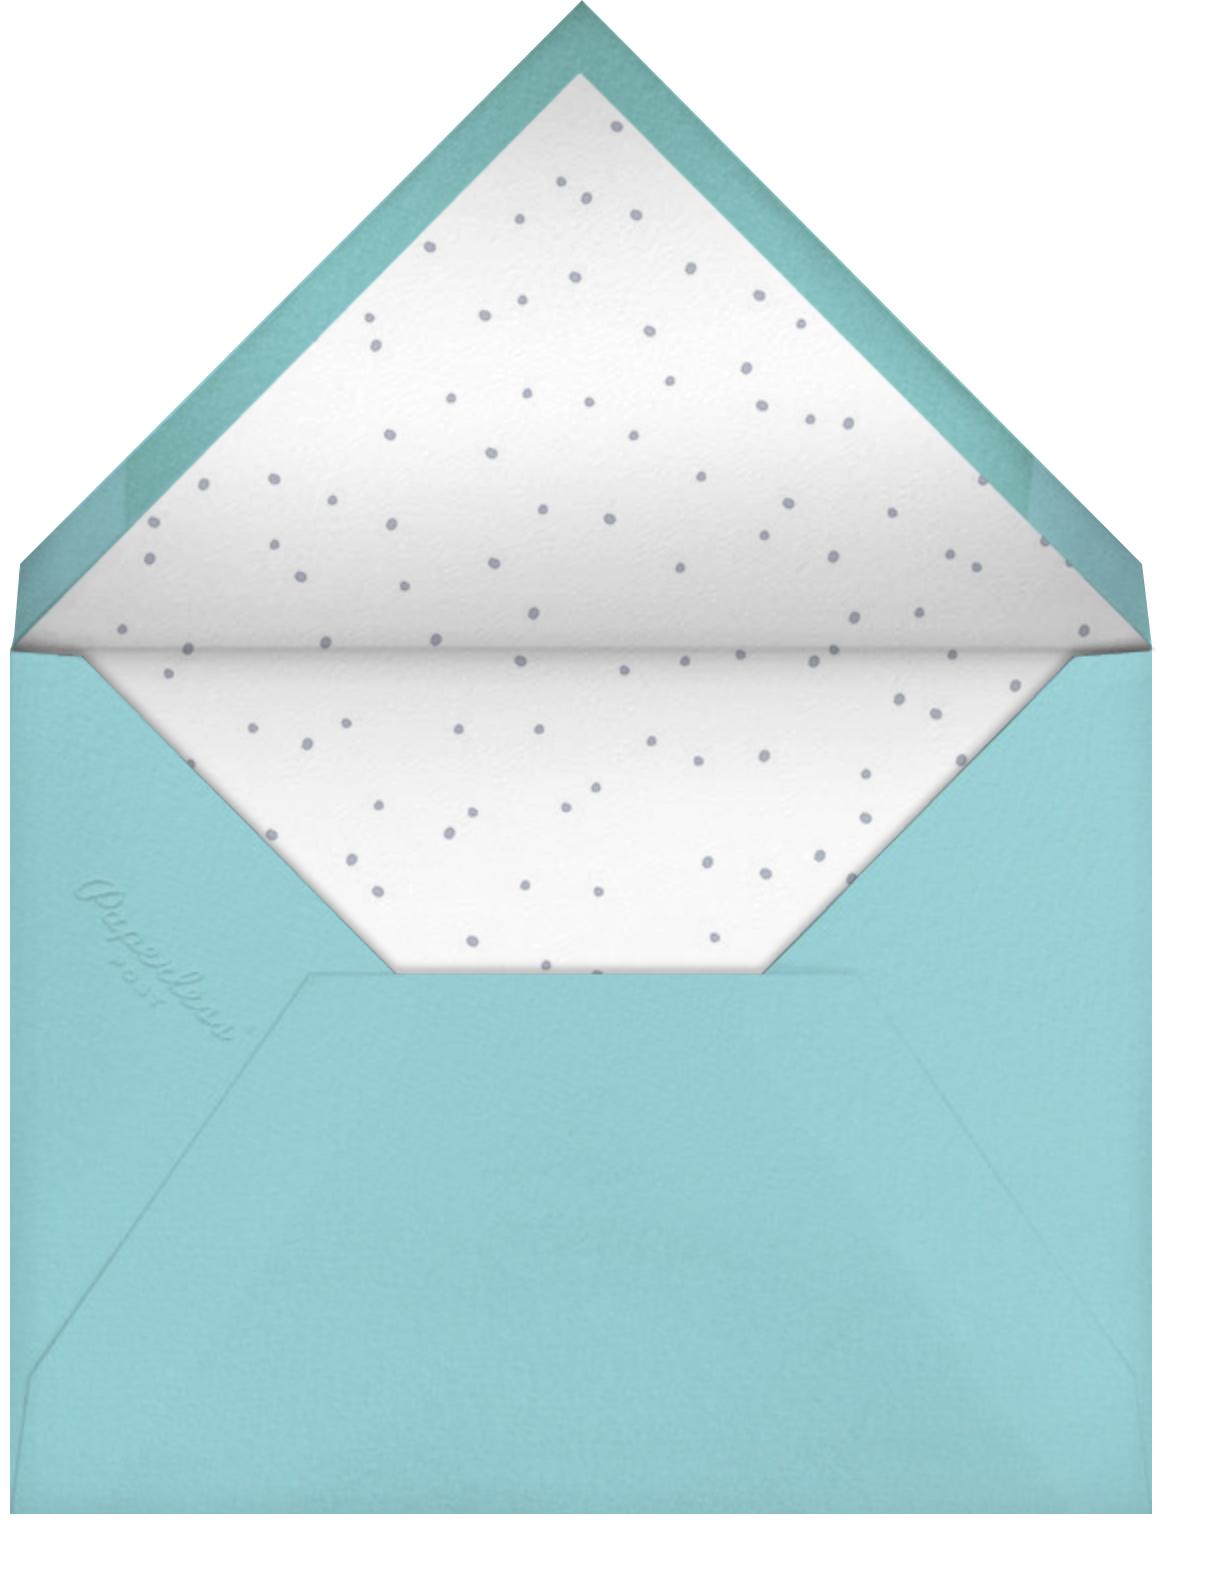 Tiggy and Jet - Little Cube - Kids' stationery - envelope back